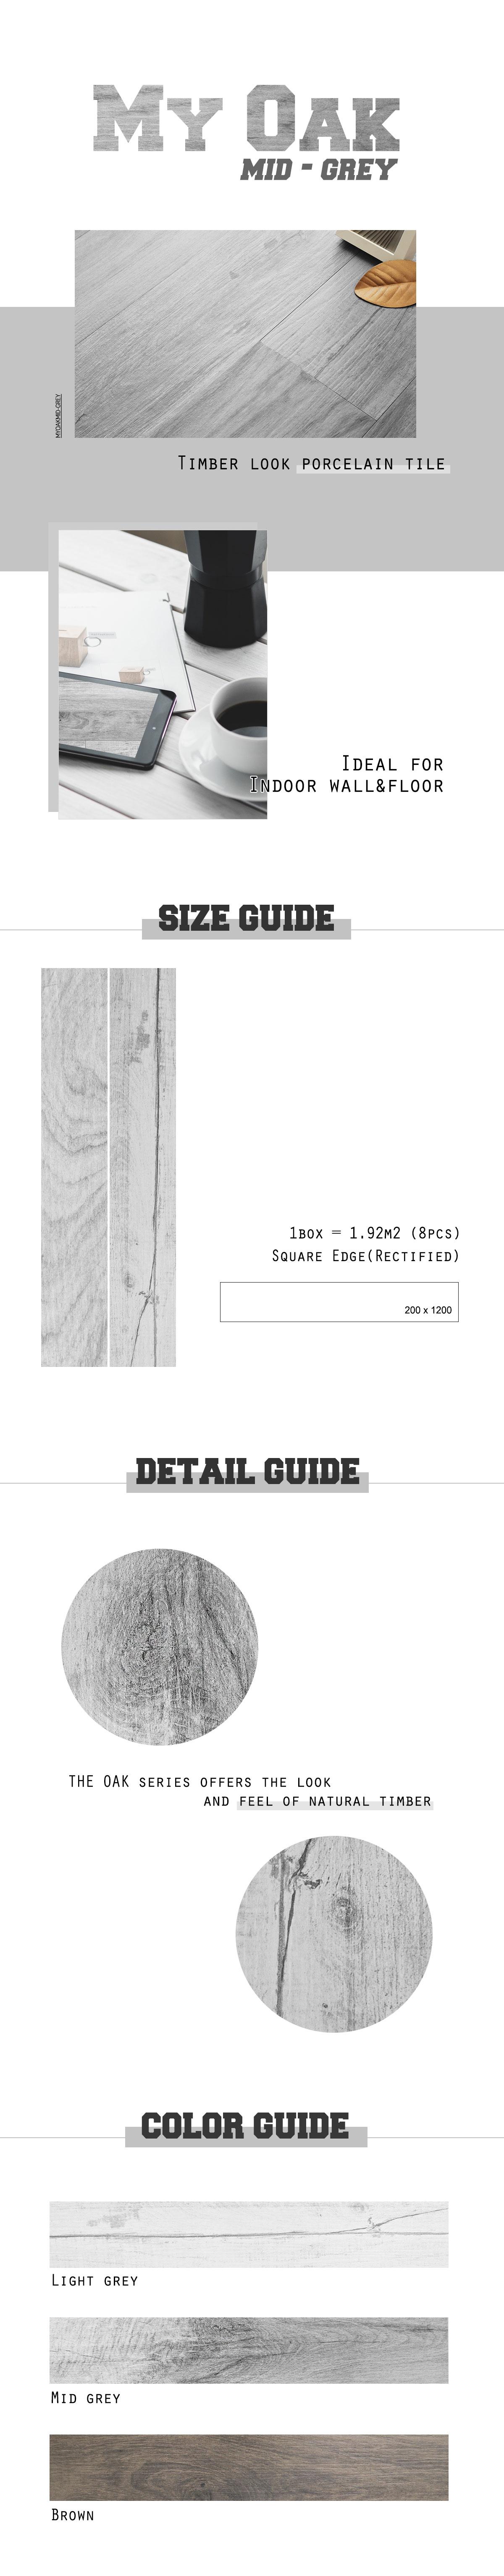 01_page design